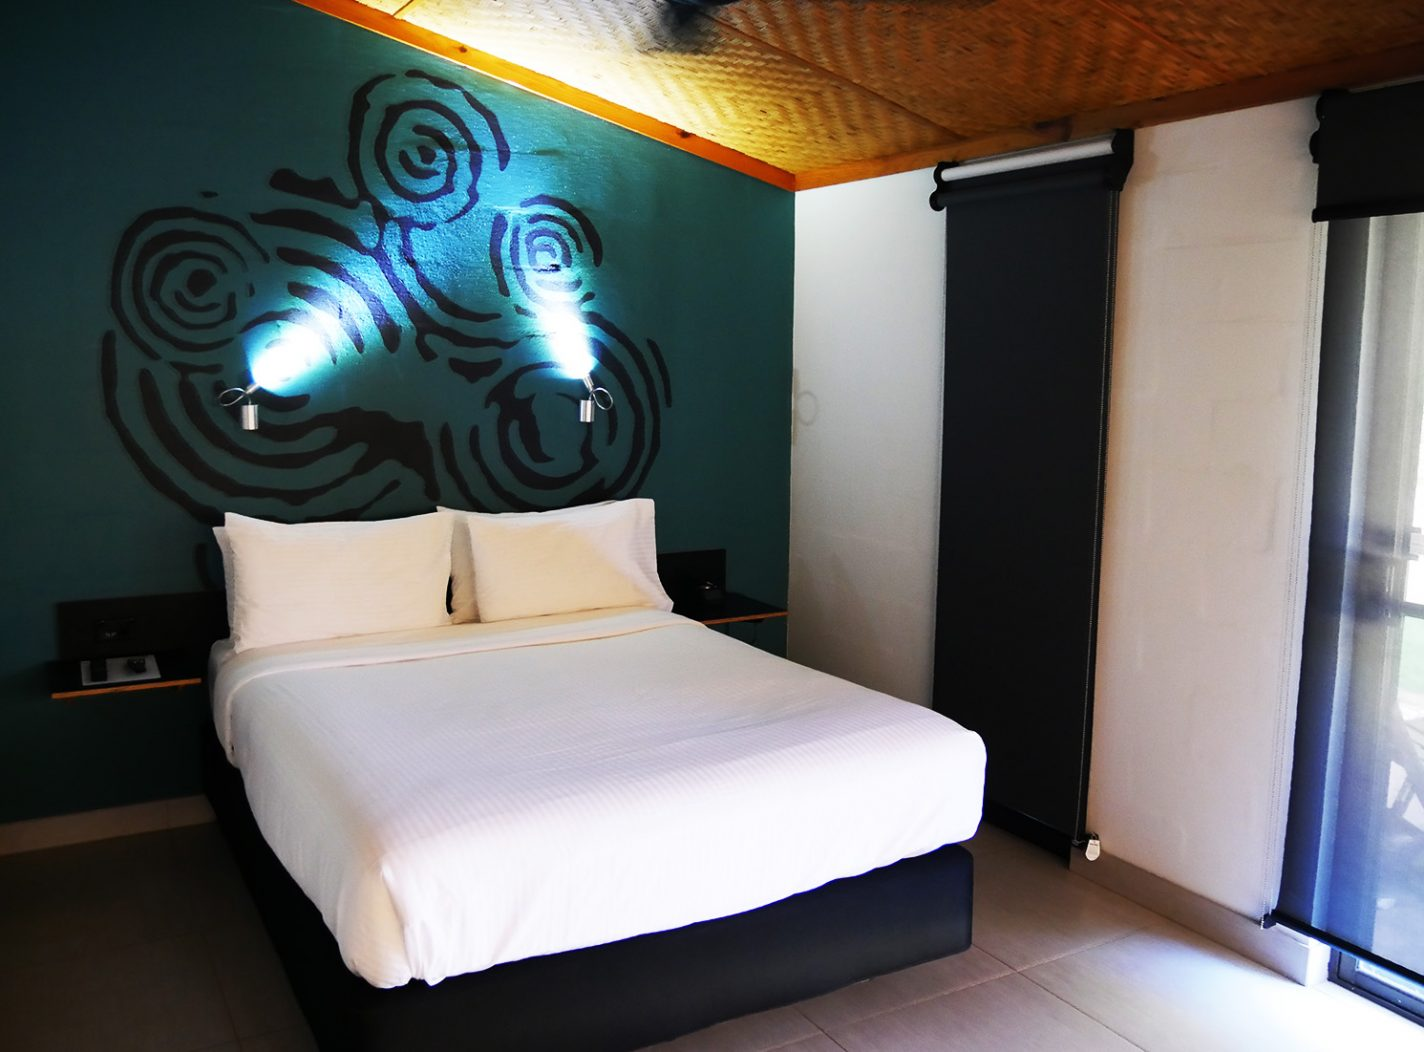 Onze kamer lodge in Cooinda